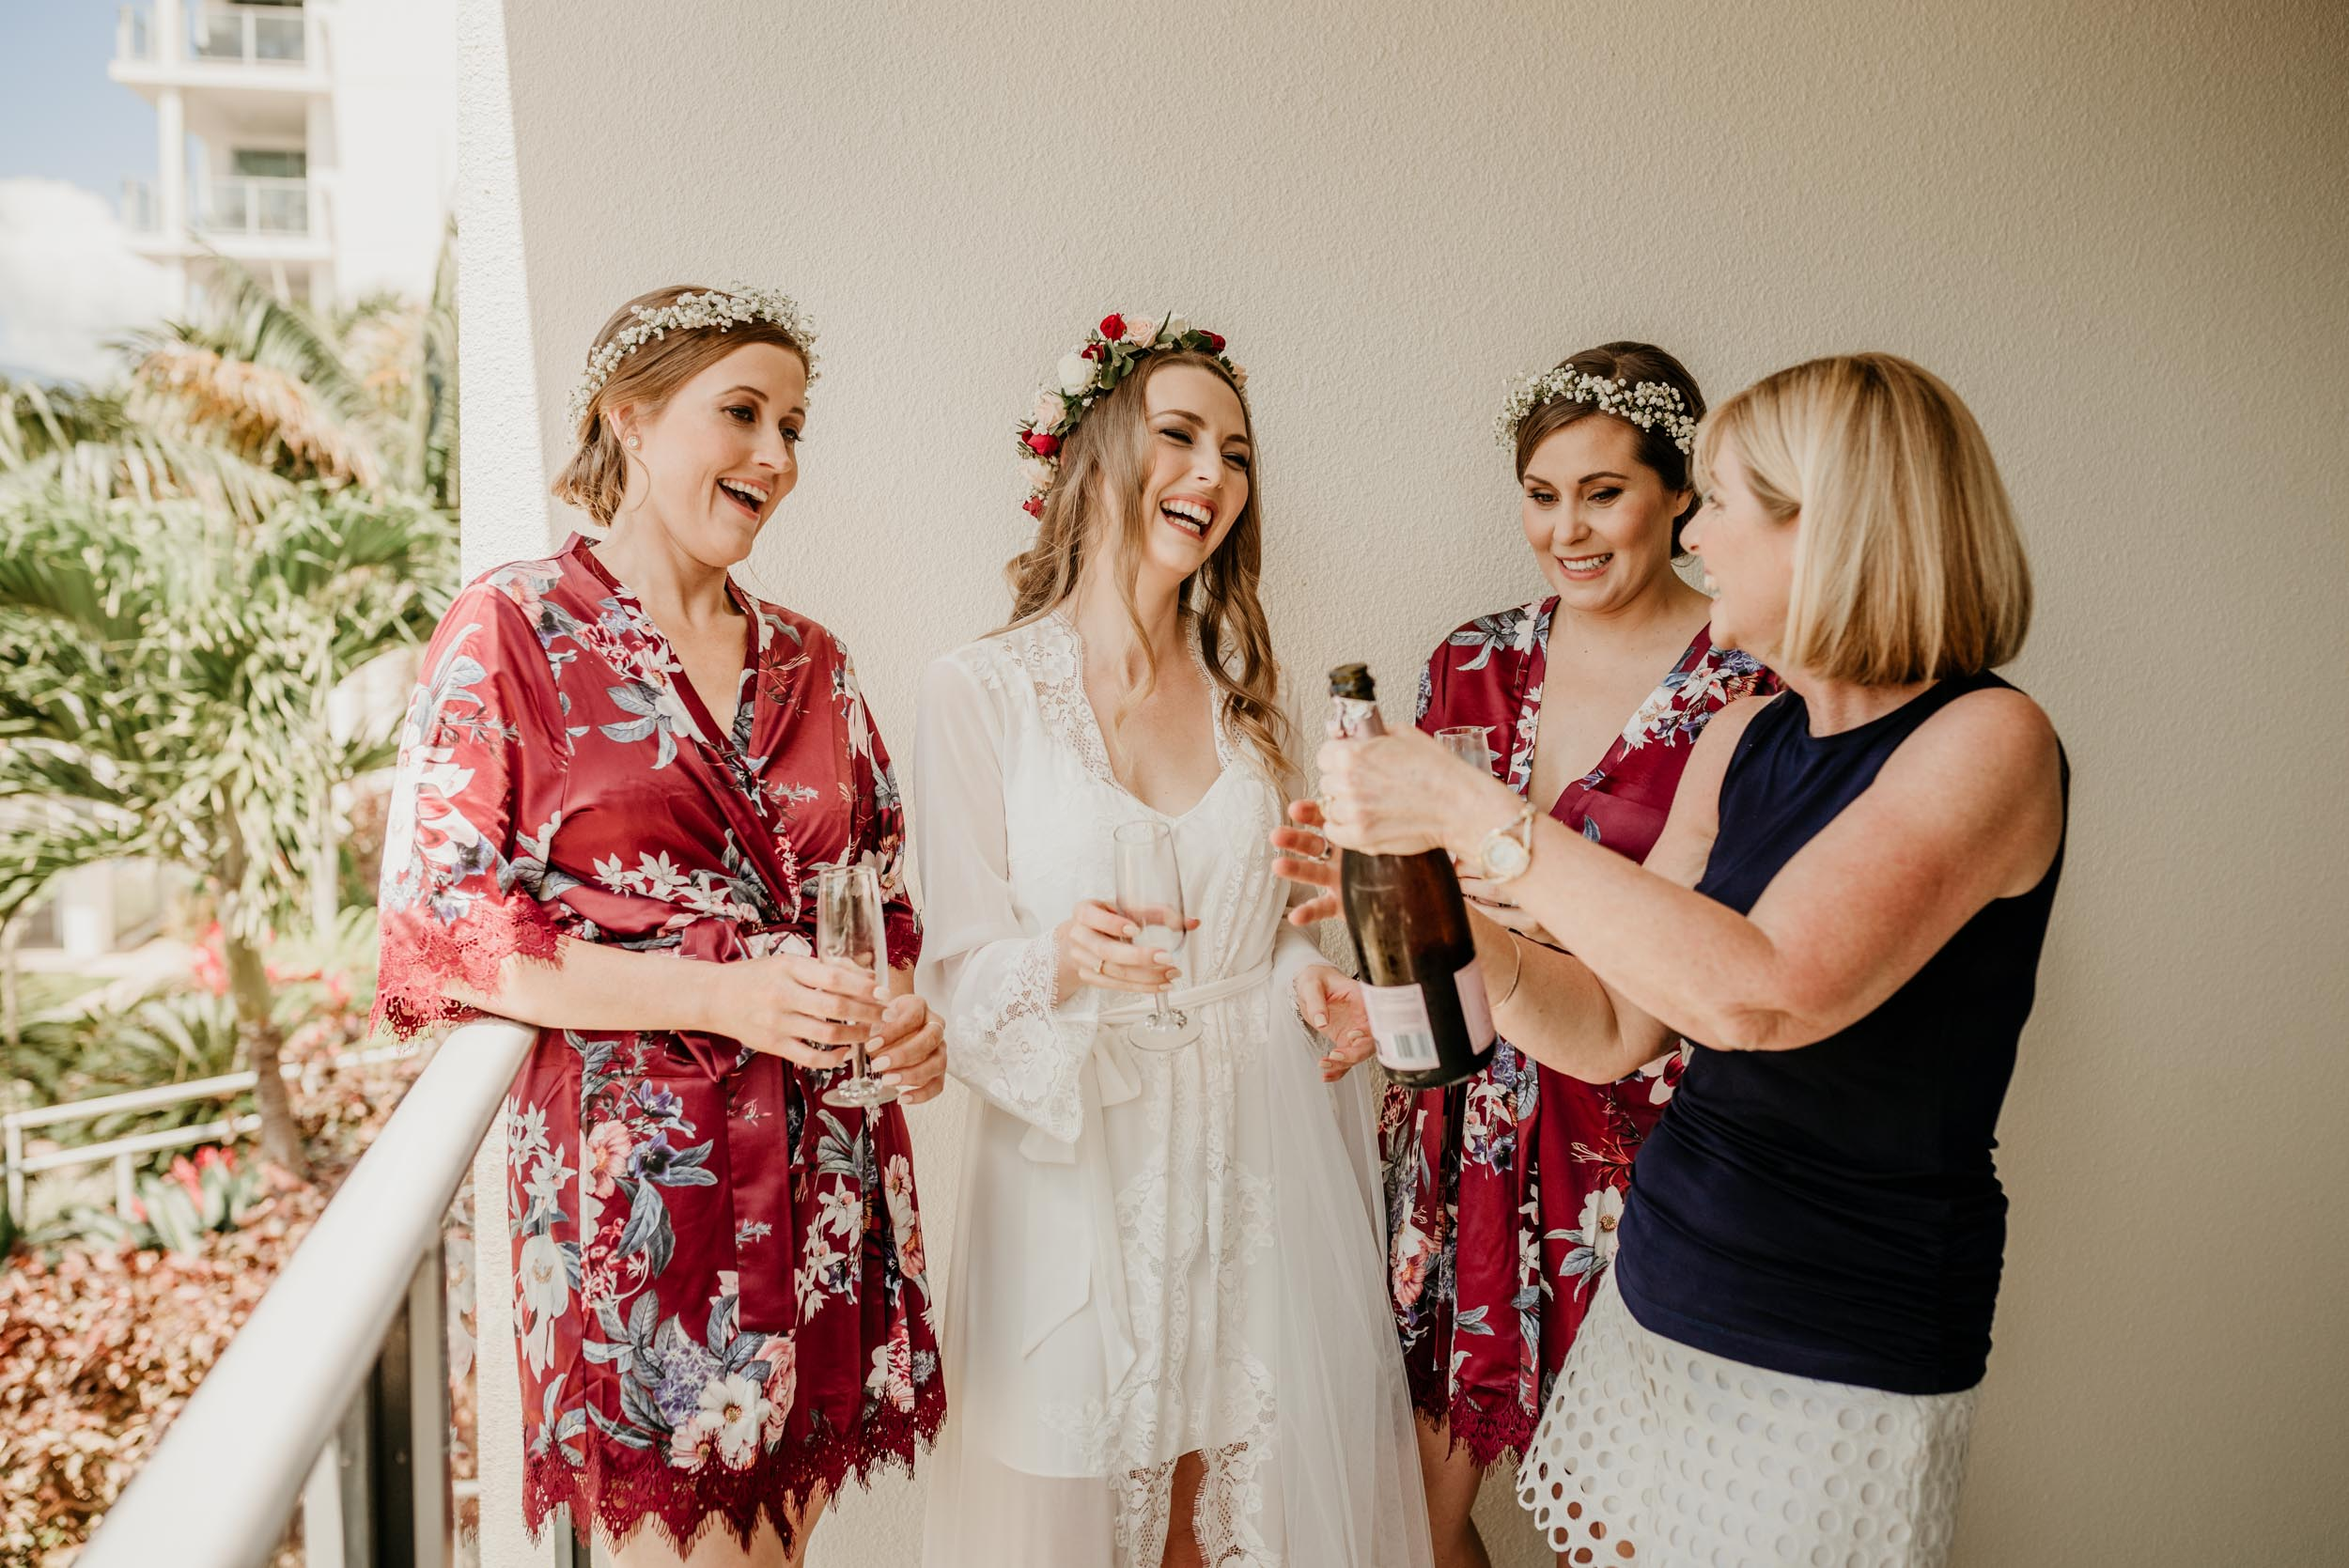 The Raw Photographer - Cairns Wedding Photographer - Laloli - Cairns Garden Ceremony - Cane Fields Photo Shoot-15.jpg